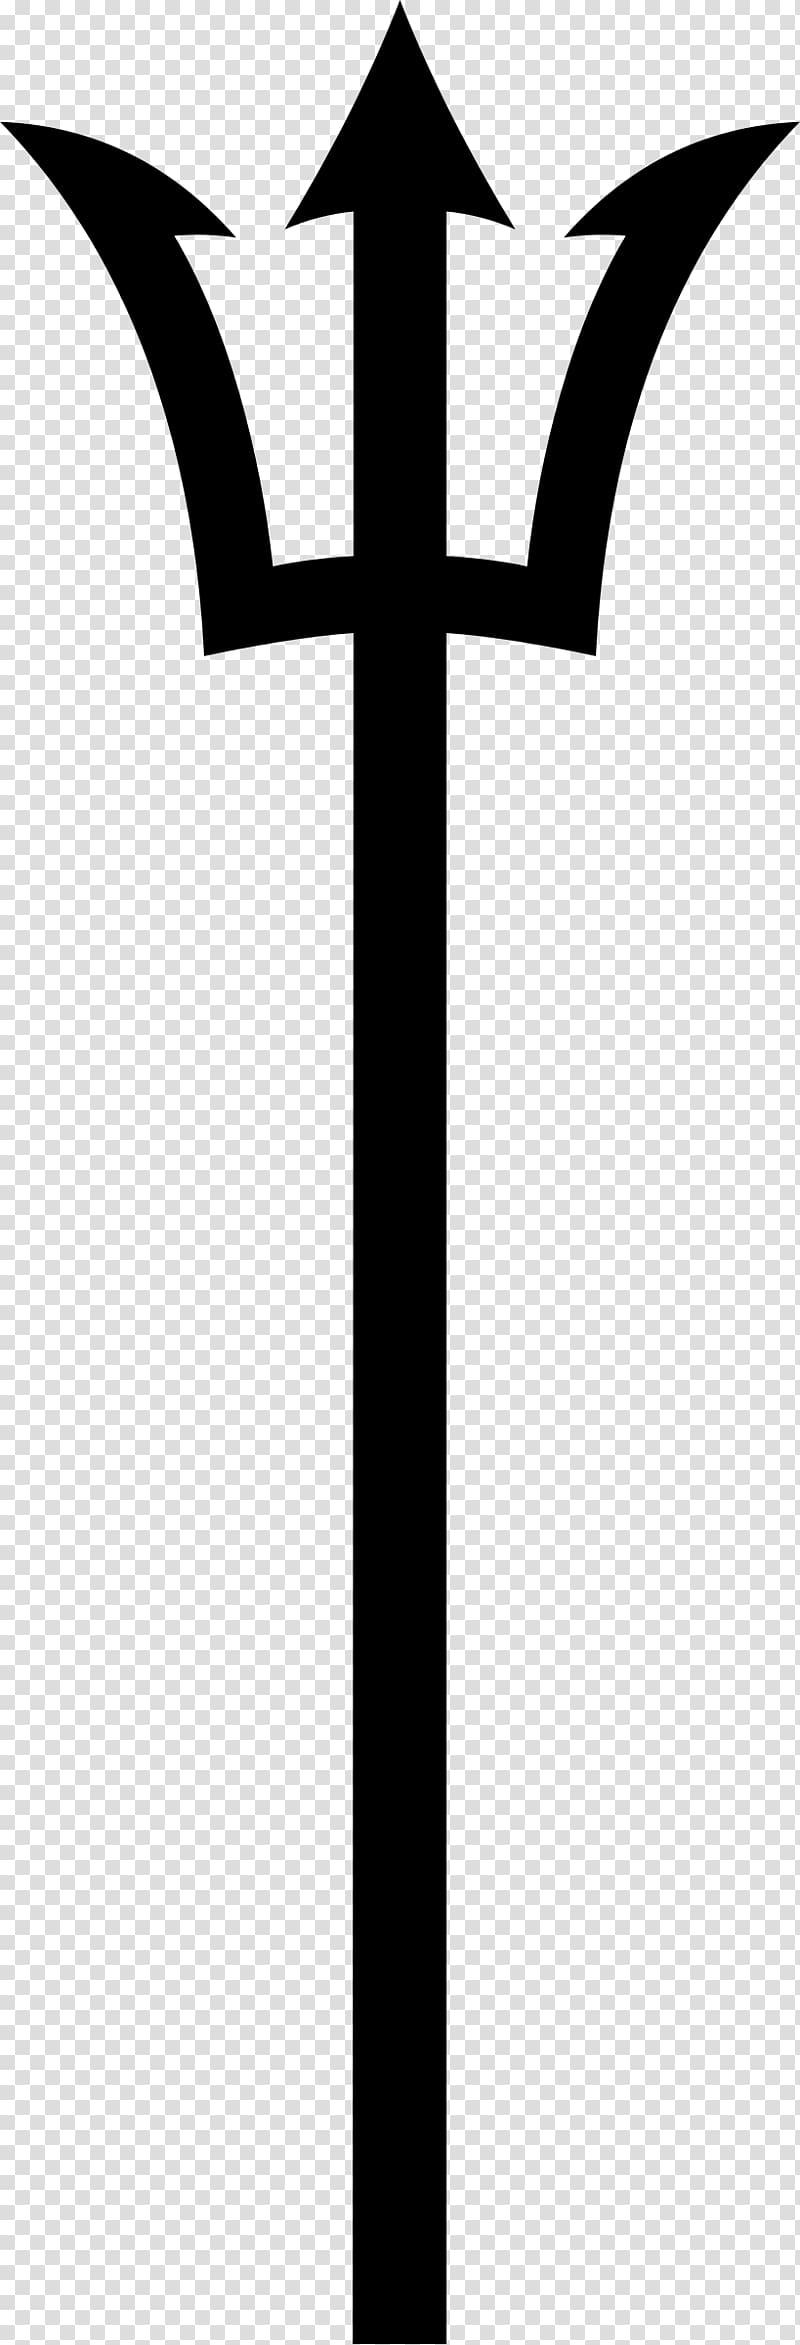 Trident , kanji transparent background PNG clipart.